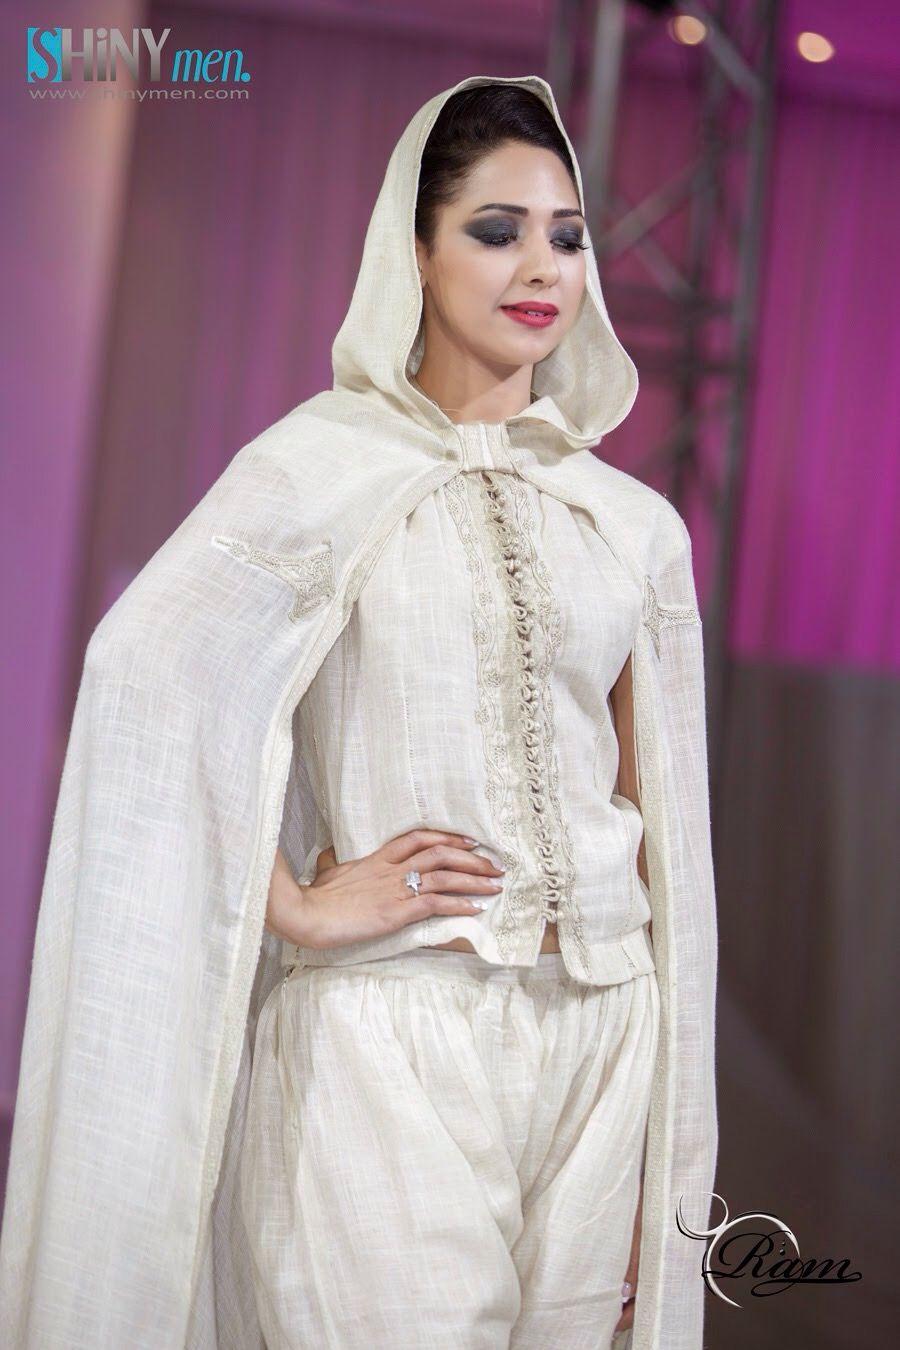 tenue tunisienne avec tissu tiss main qu on appelle hayek la broderie est typiquement. Black Bedroom Furniture Sets. Home Design Ideas